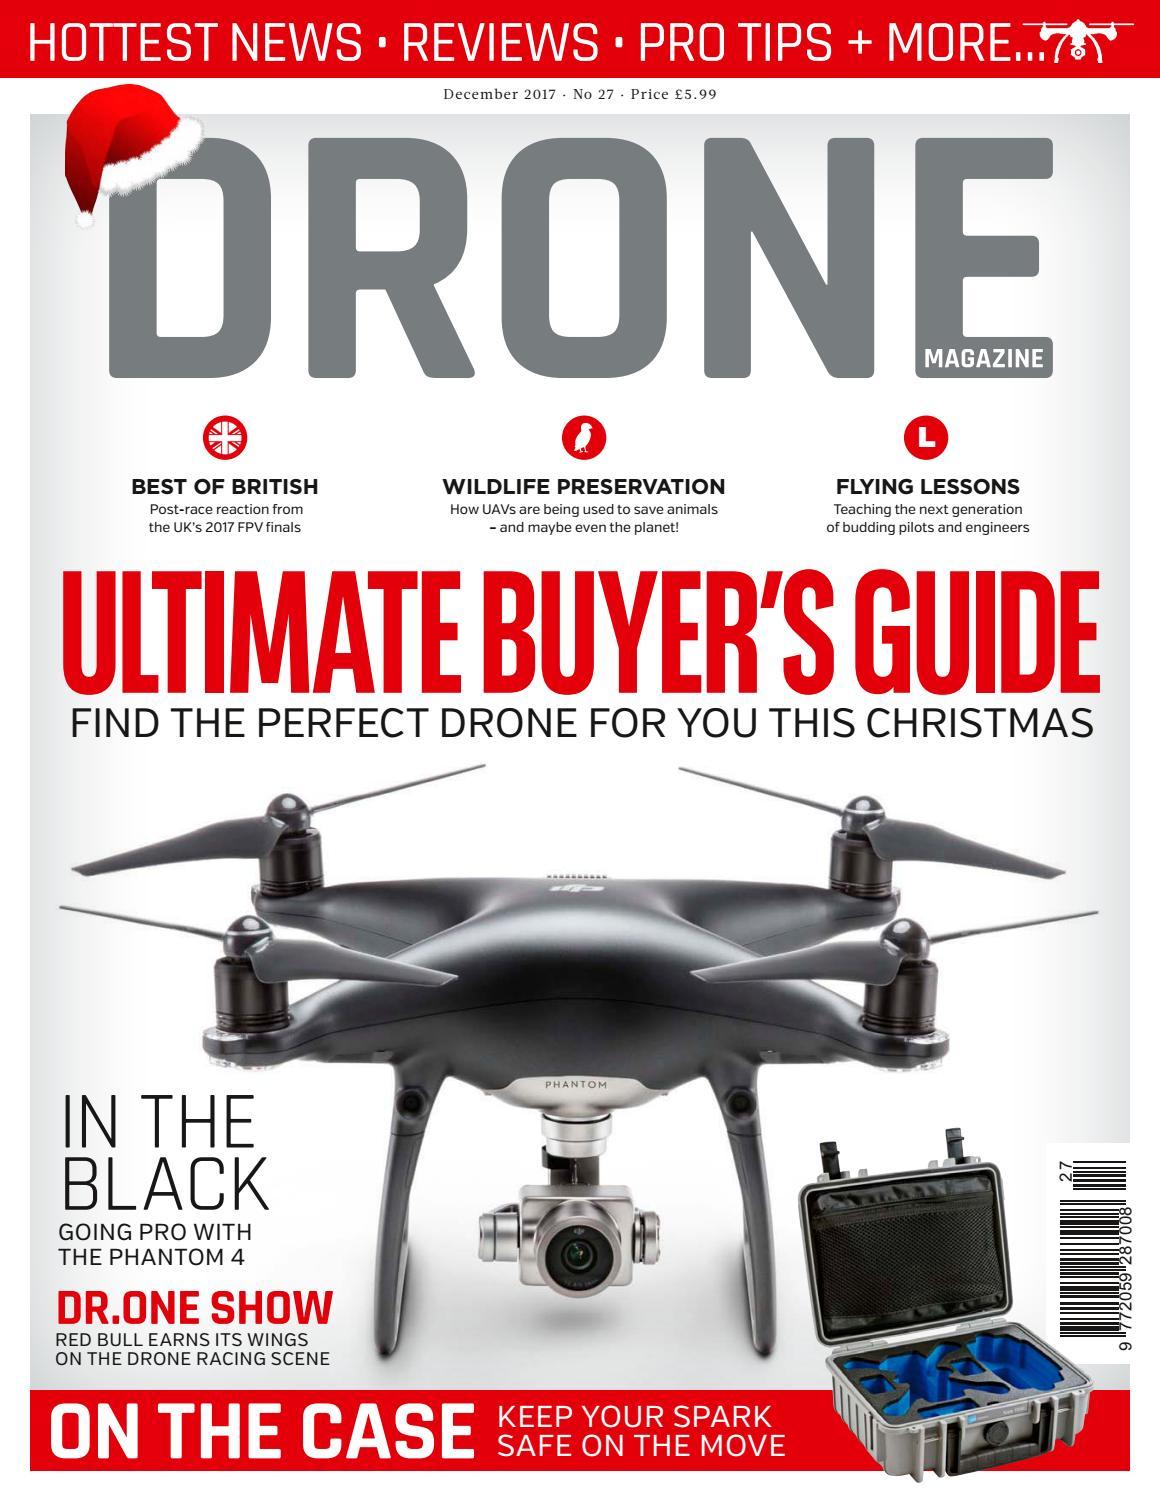 Mavic 2 Zoom OPERATOR ID UK Sticker Decal Drone 2X Carbon Dji Mavic 2 Pro